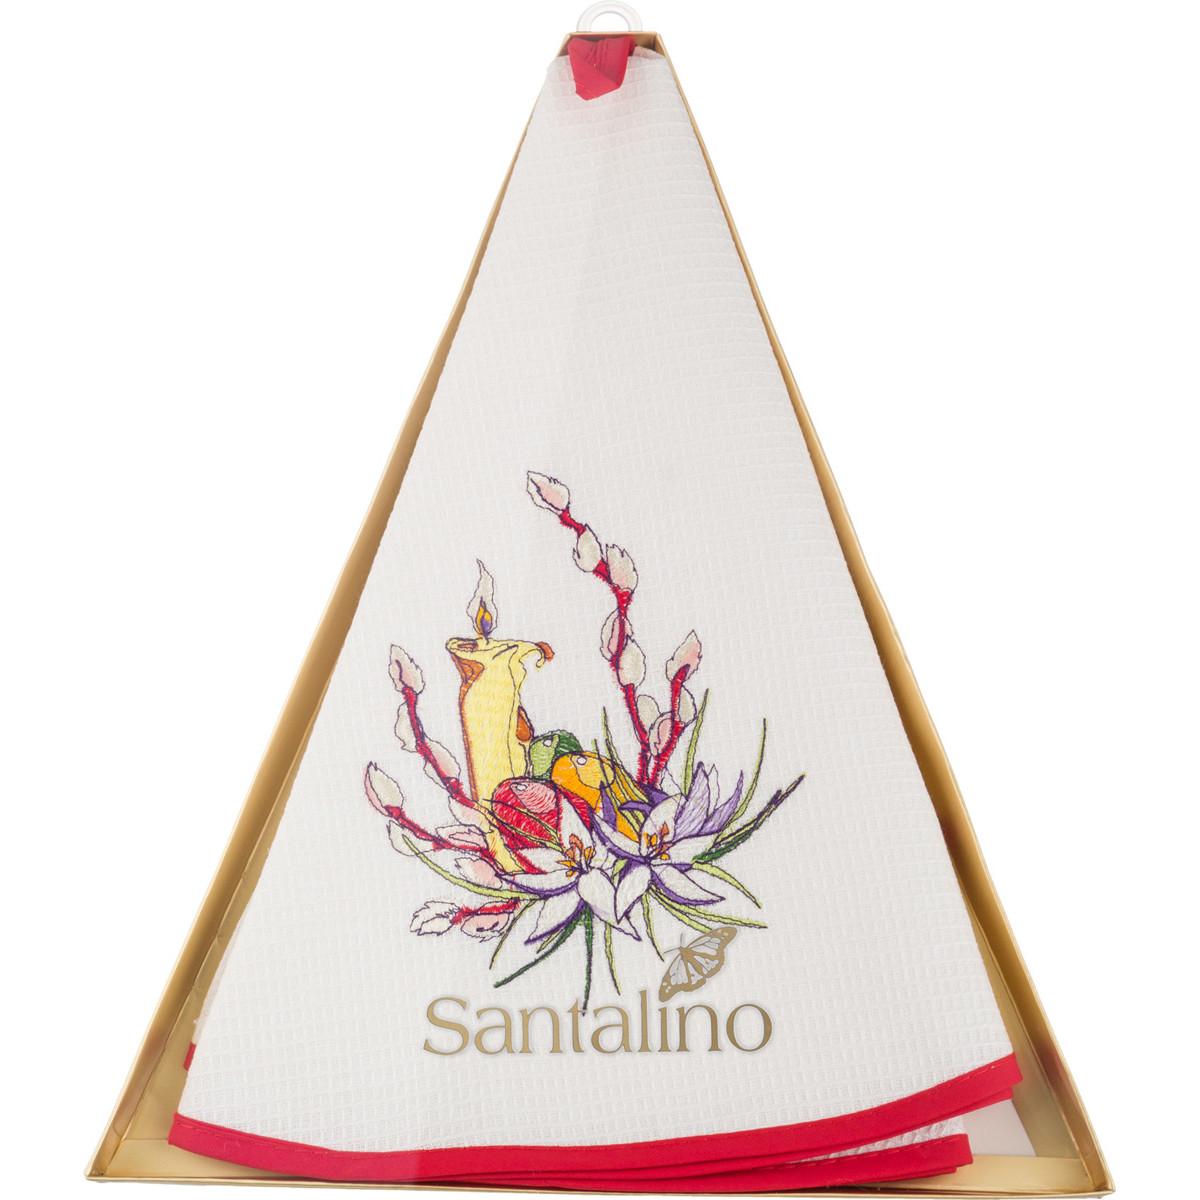 {} Santalino Кухонное полотенце Gable (круглая 70 см) santalino кухонное полотенце amey круглая 70 см